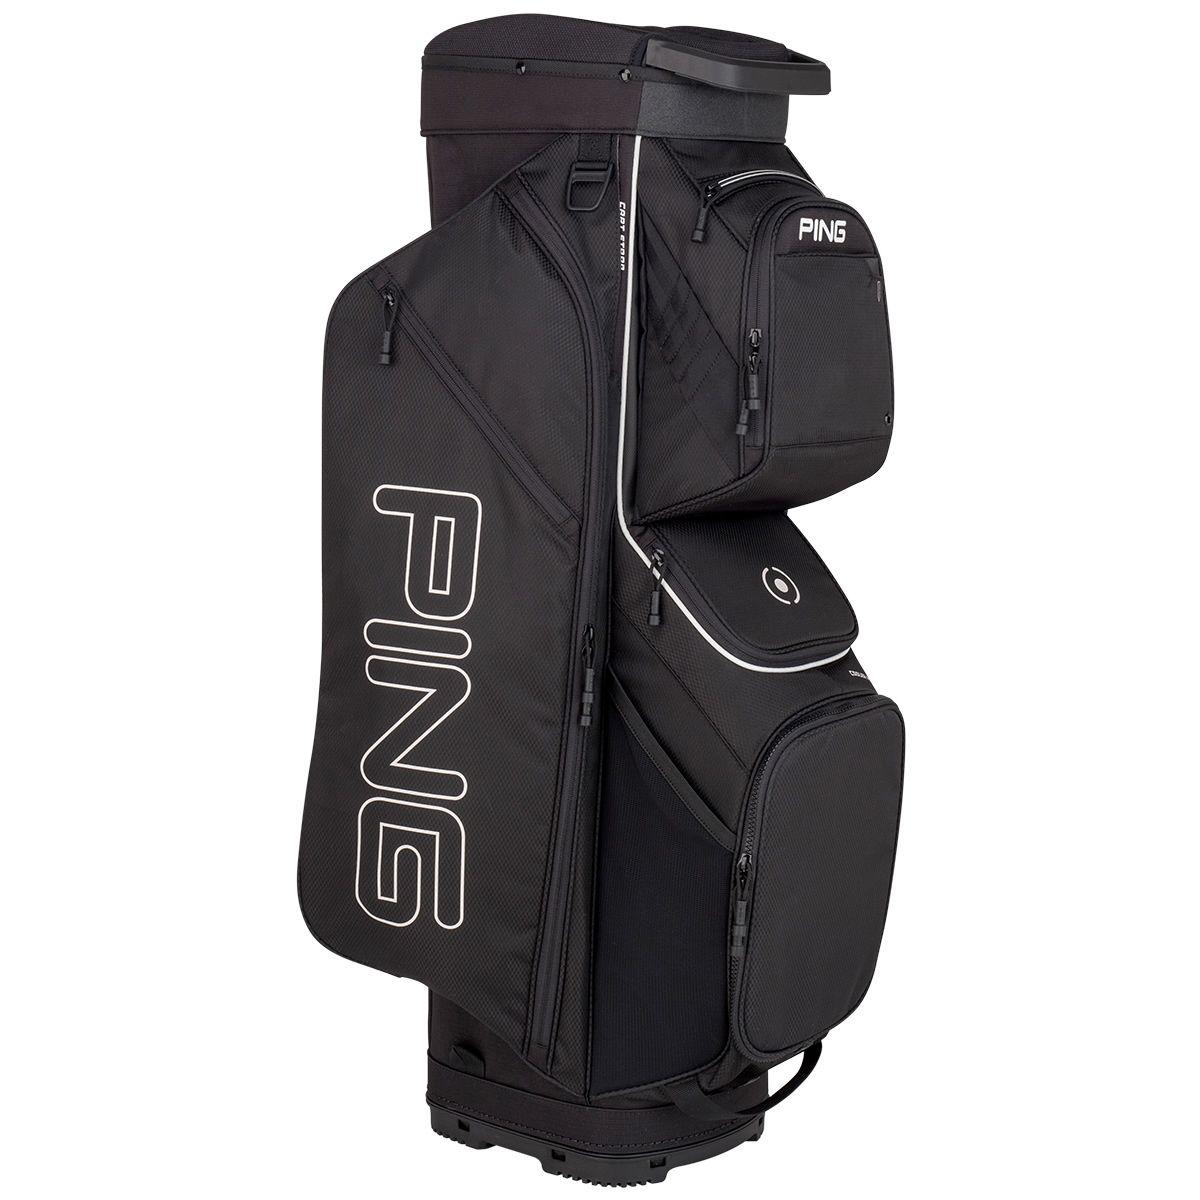 Ping 2020 Traverse Golf Cart Bag